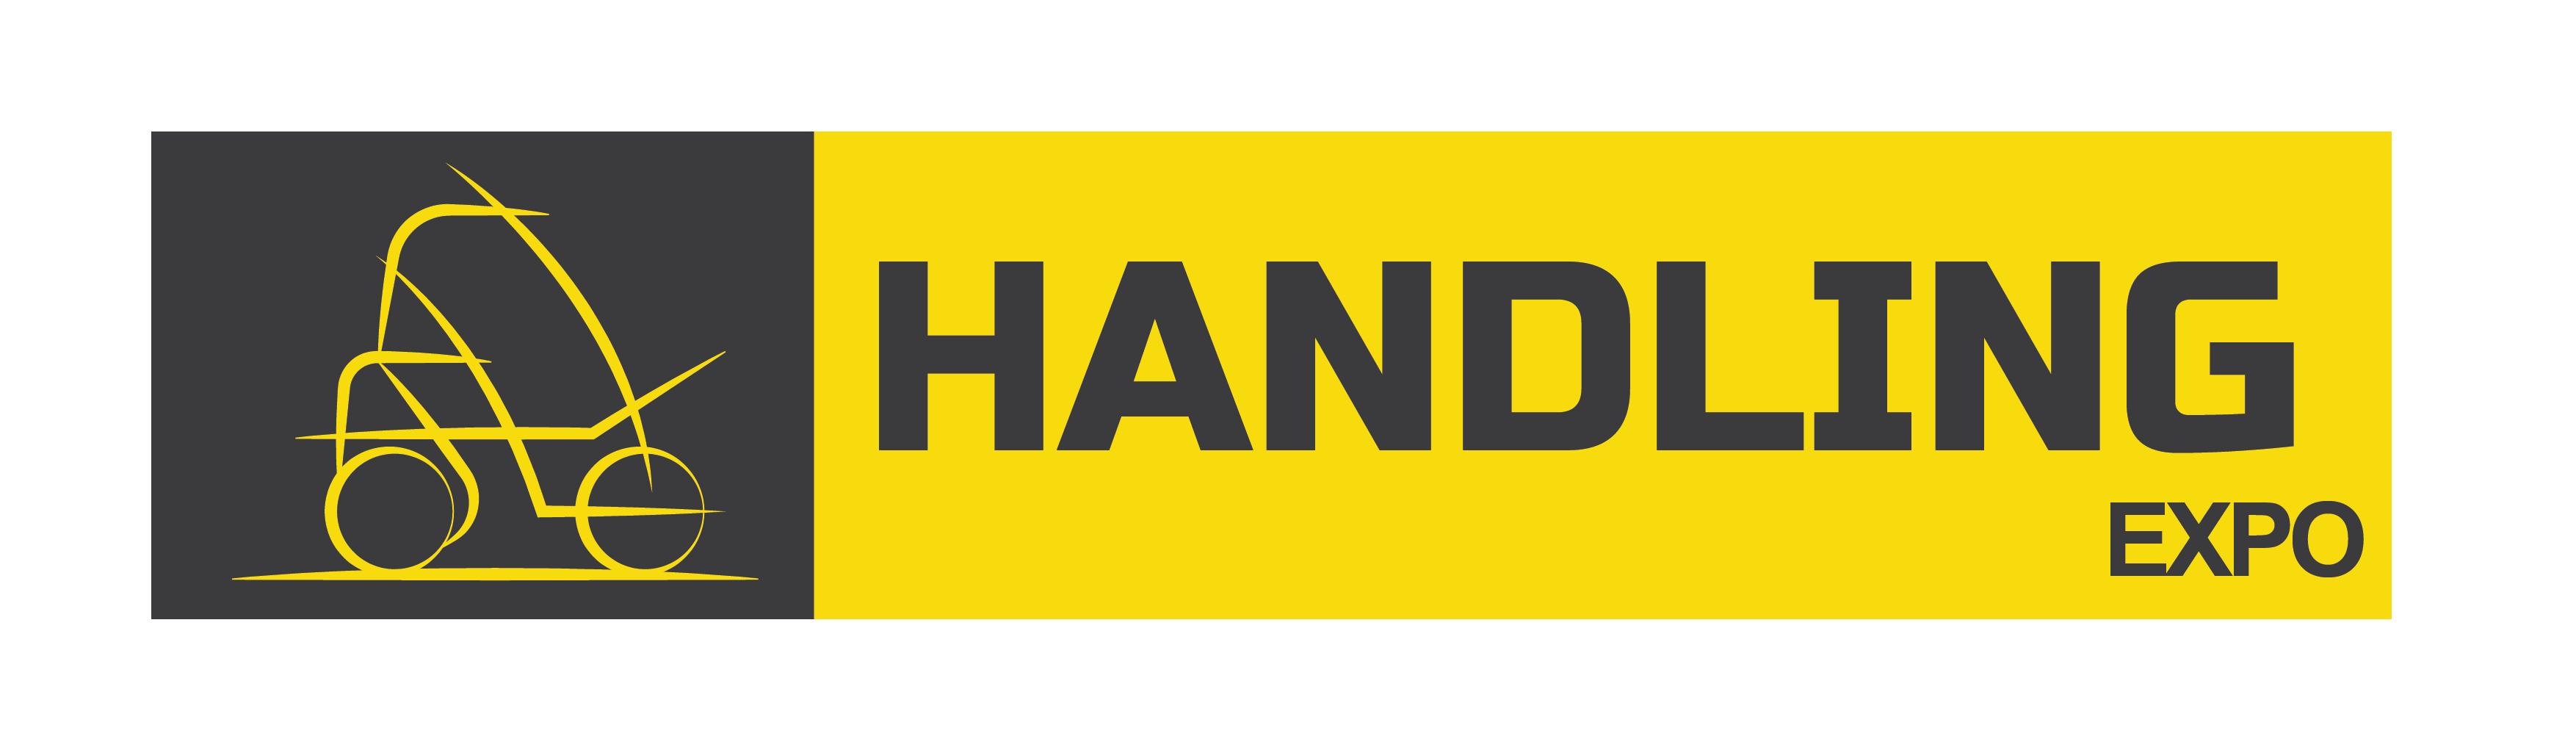 Handling – IFG